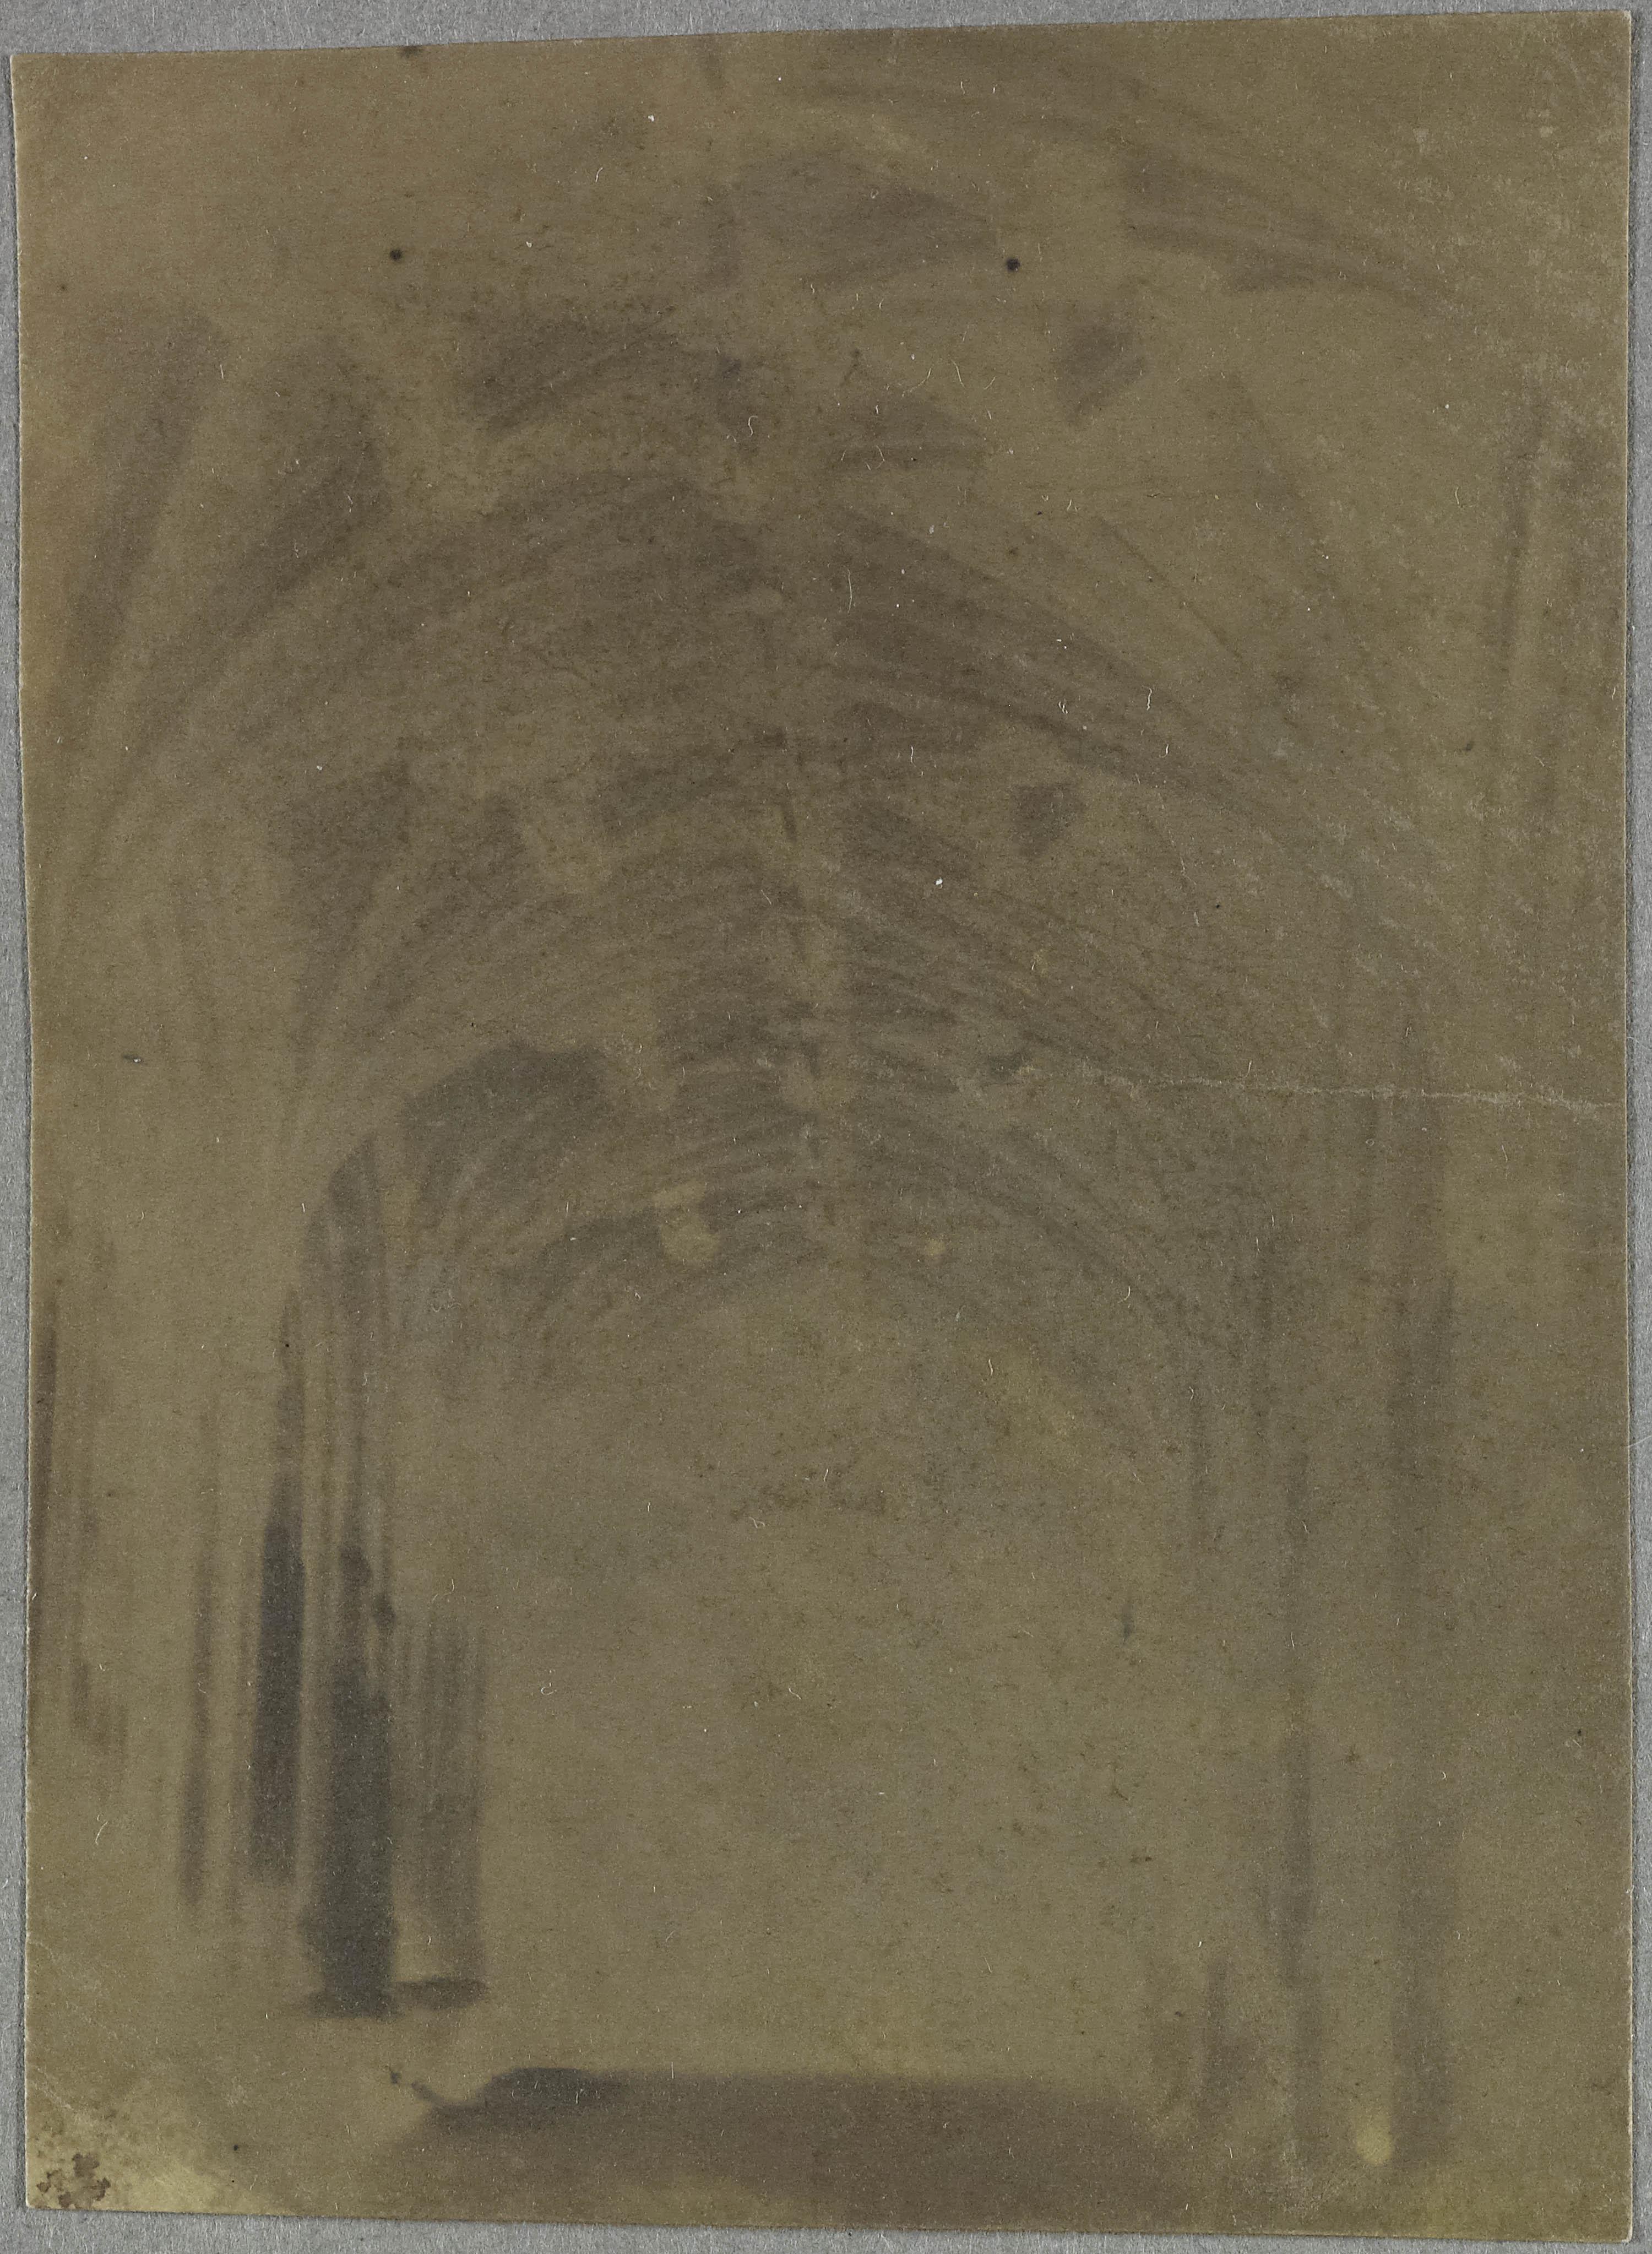 sc2084_1_1_1937-1601